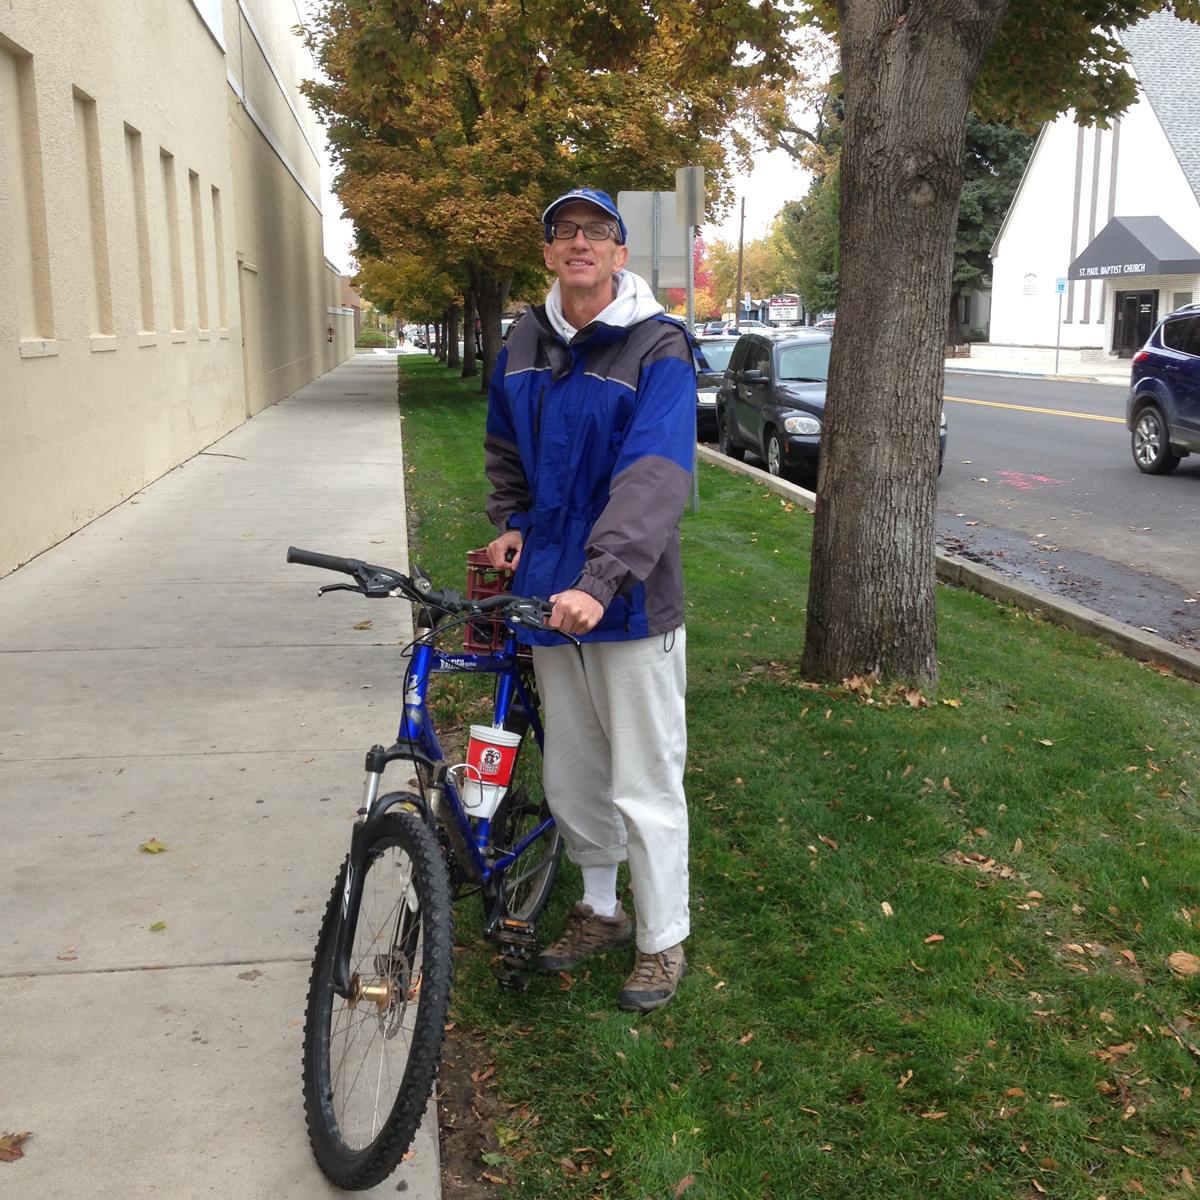 Richard Eborn lives a car-free lifestyle in Boise, Idaho.